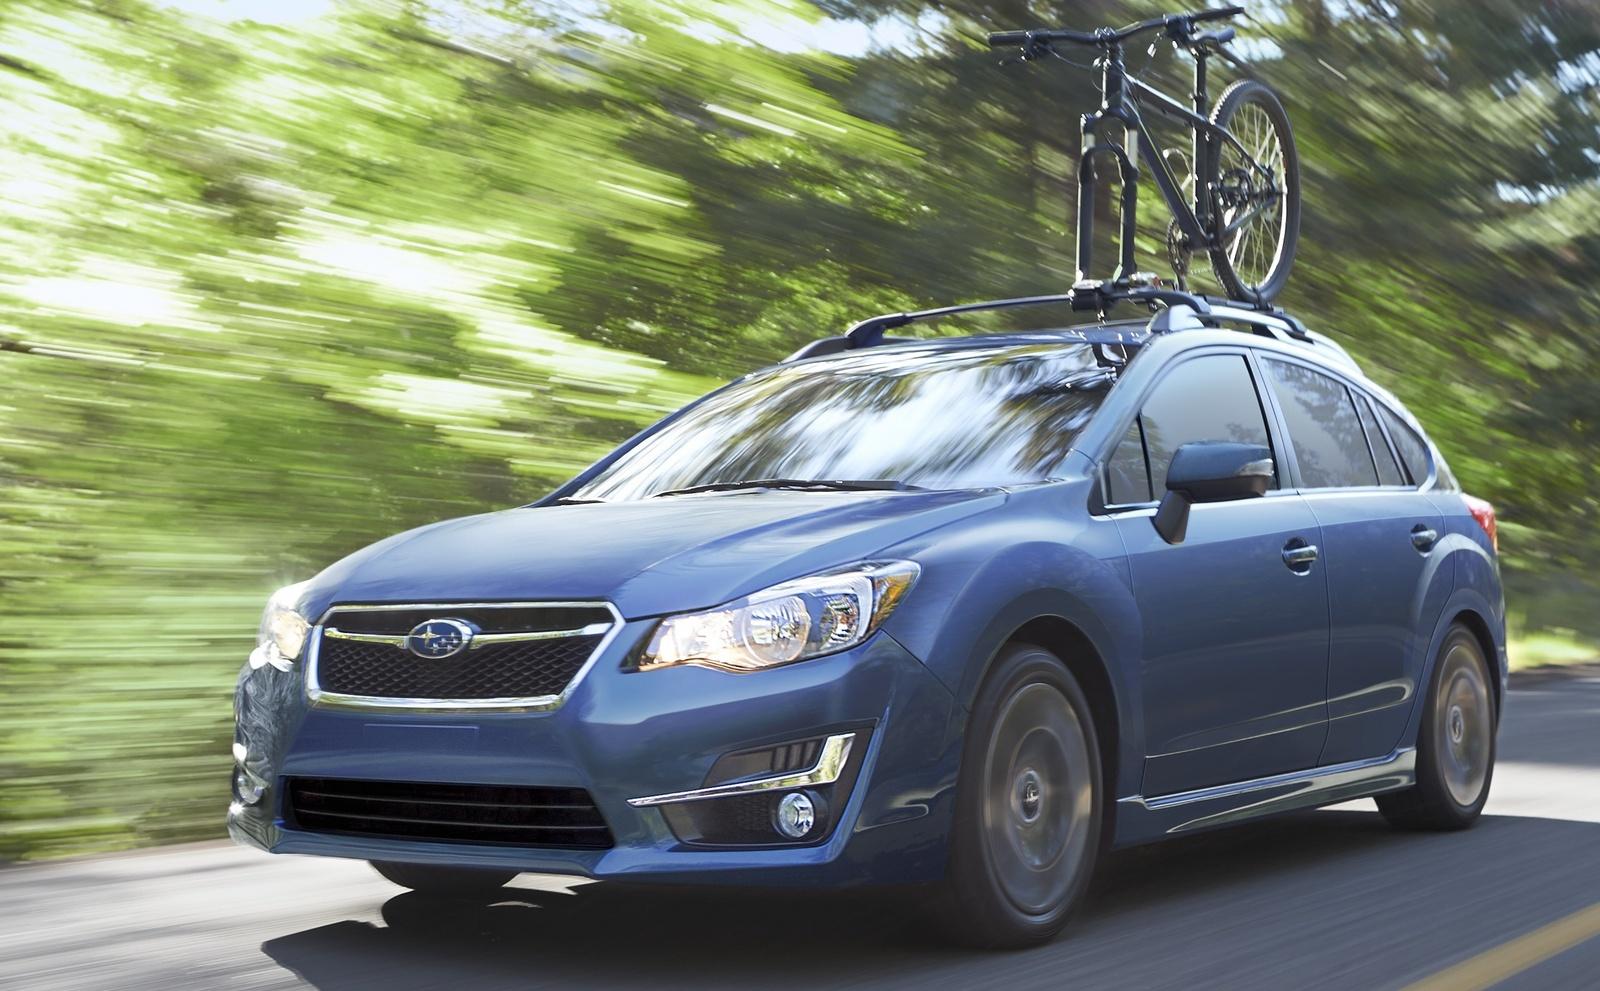 Test Drive Review 2015 Subaru Impreza 5148 Cars Performance Alternator Wiring Diagram